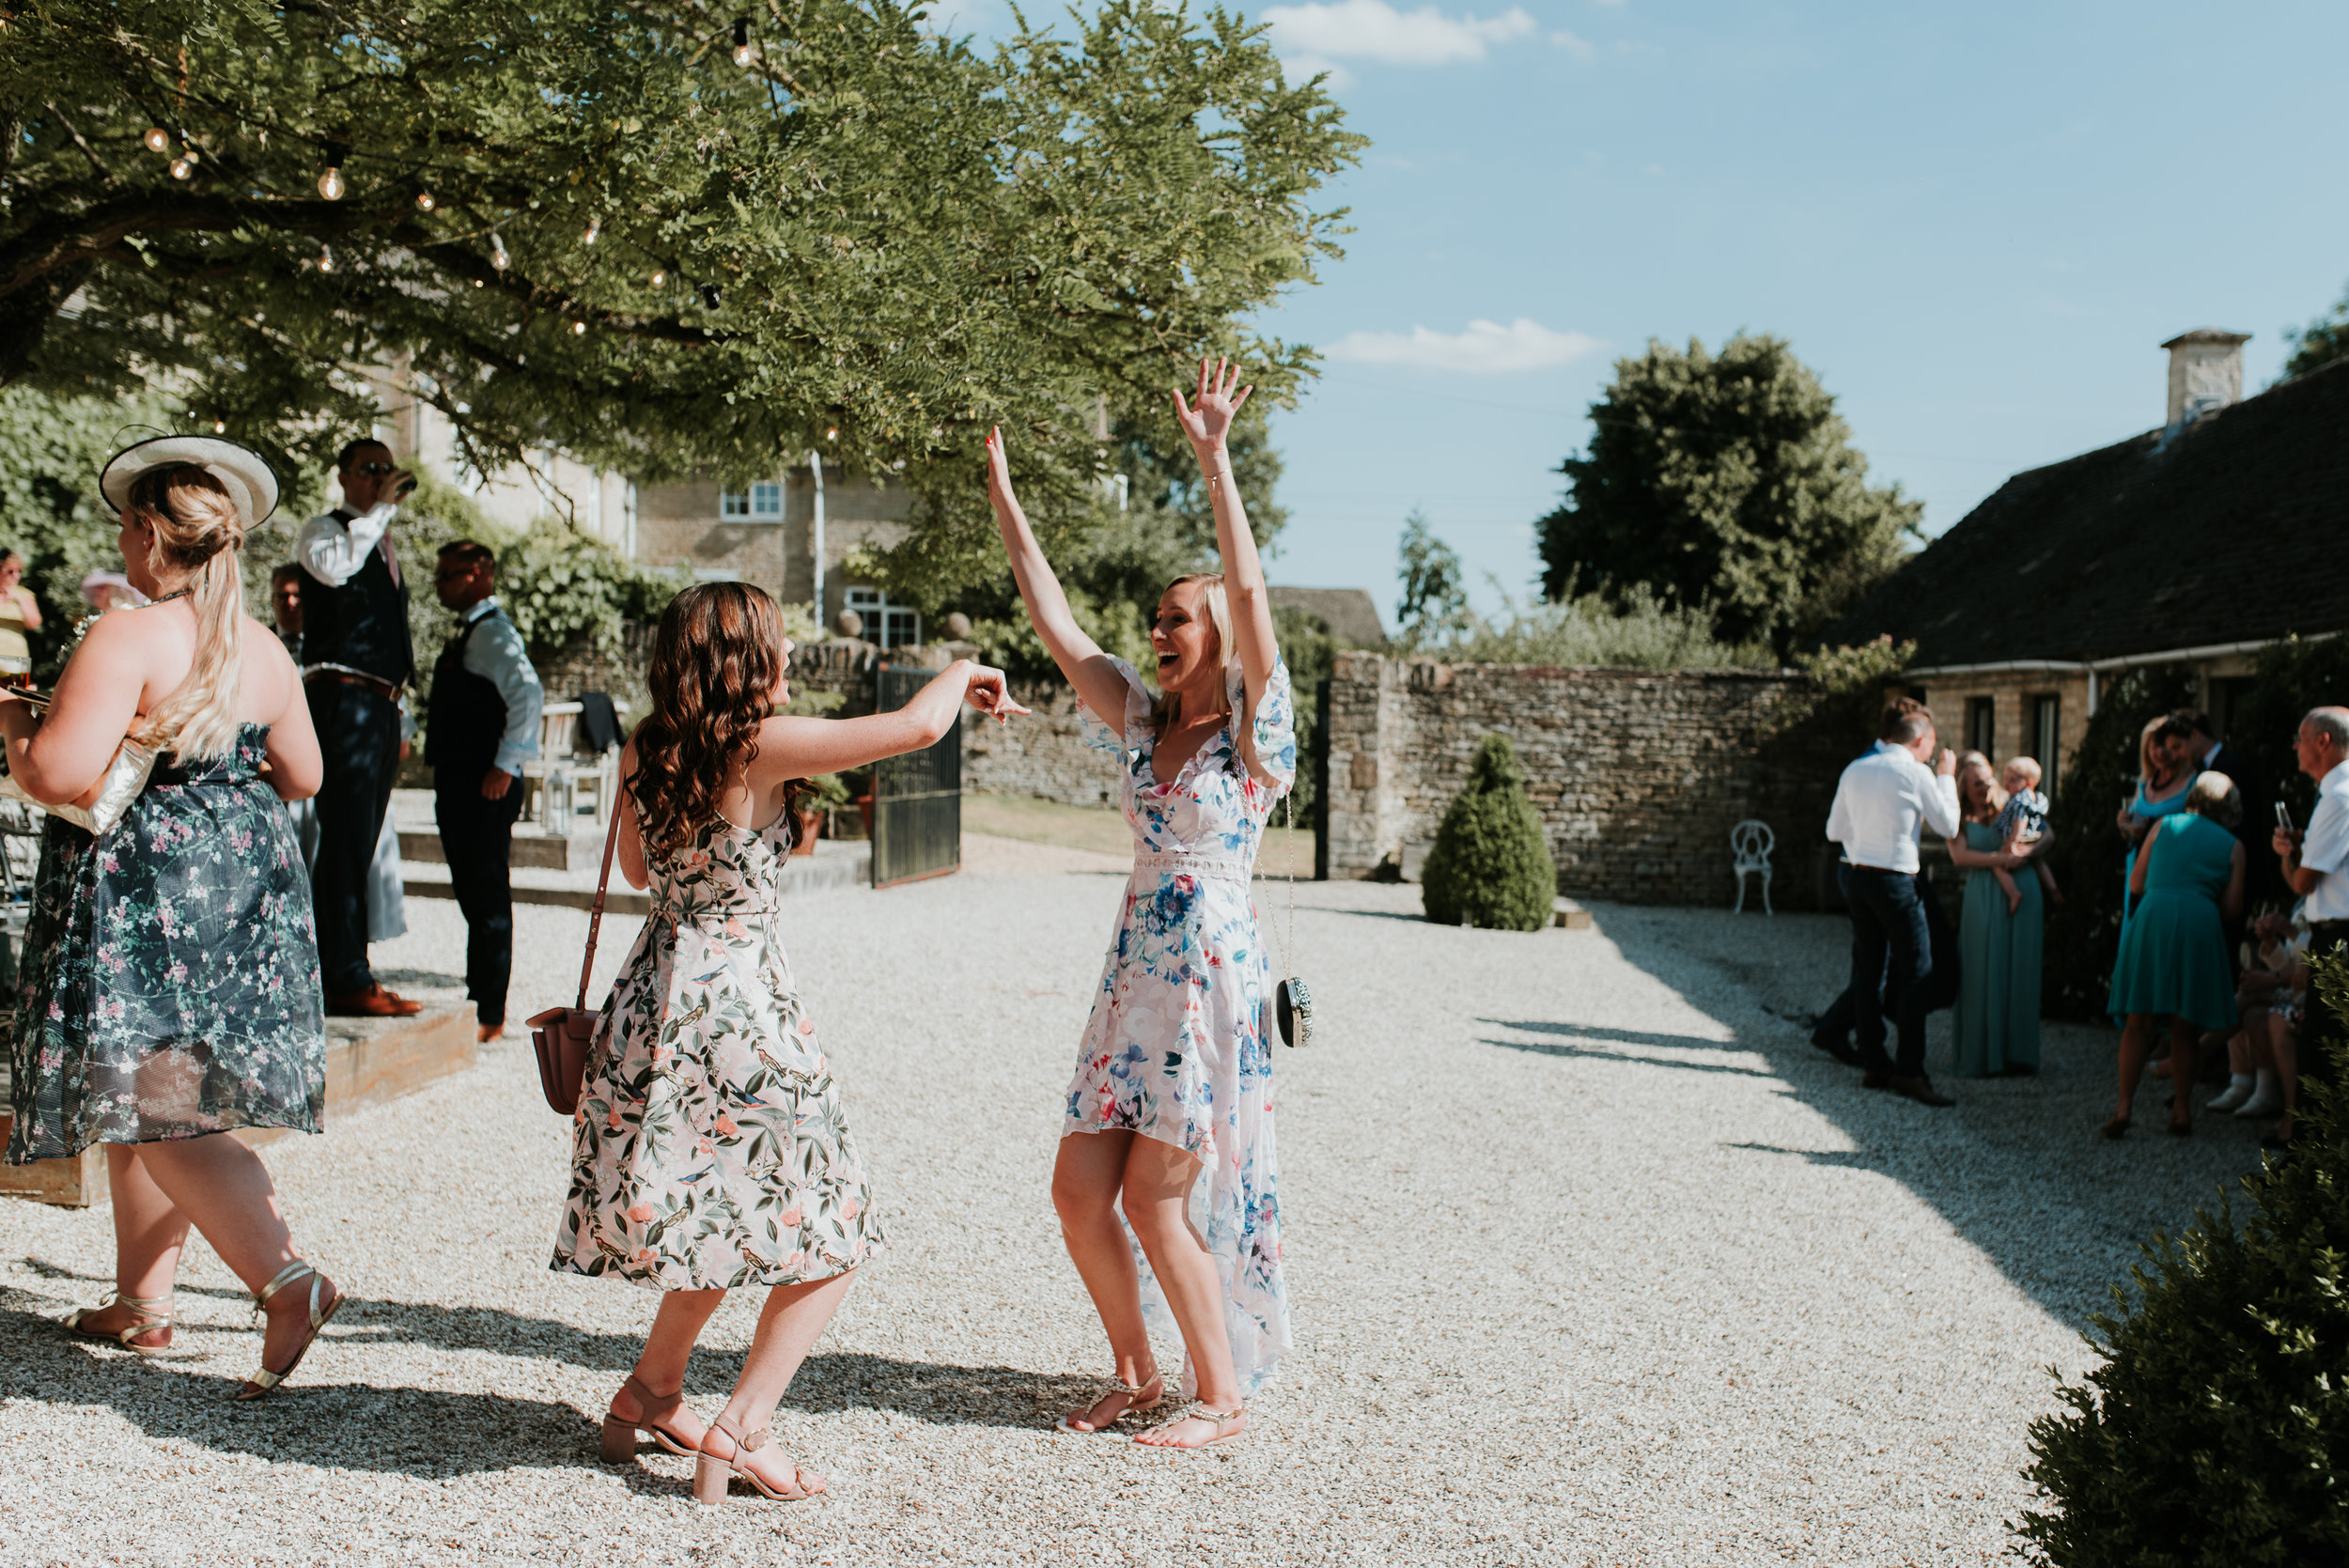 Oxfordshire-wedding-photographer-59.jpg